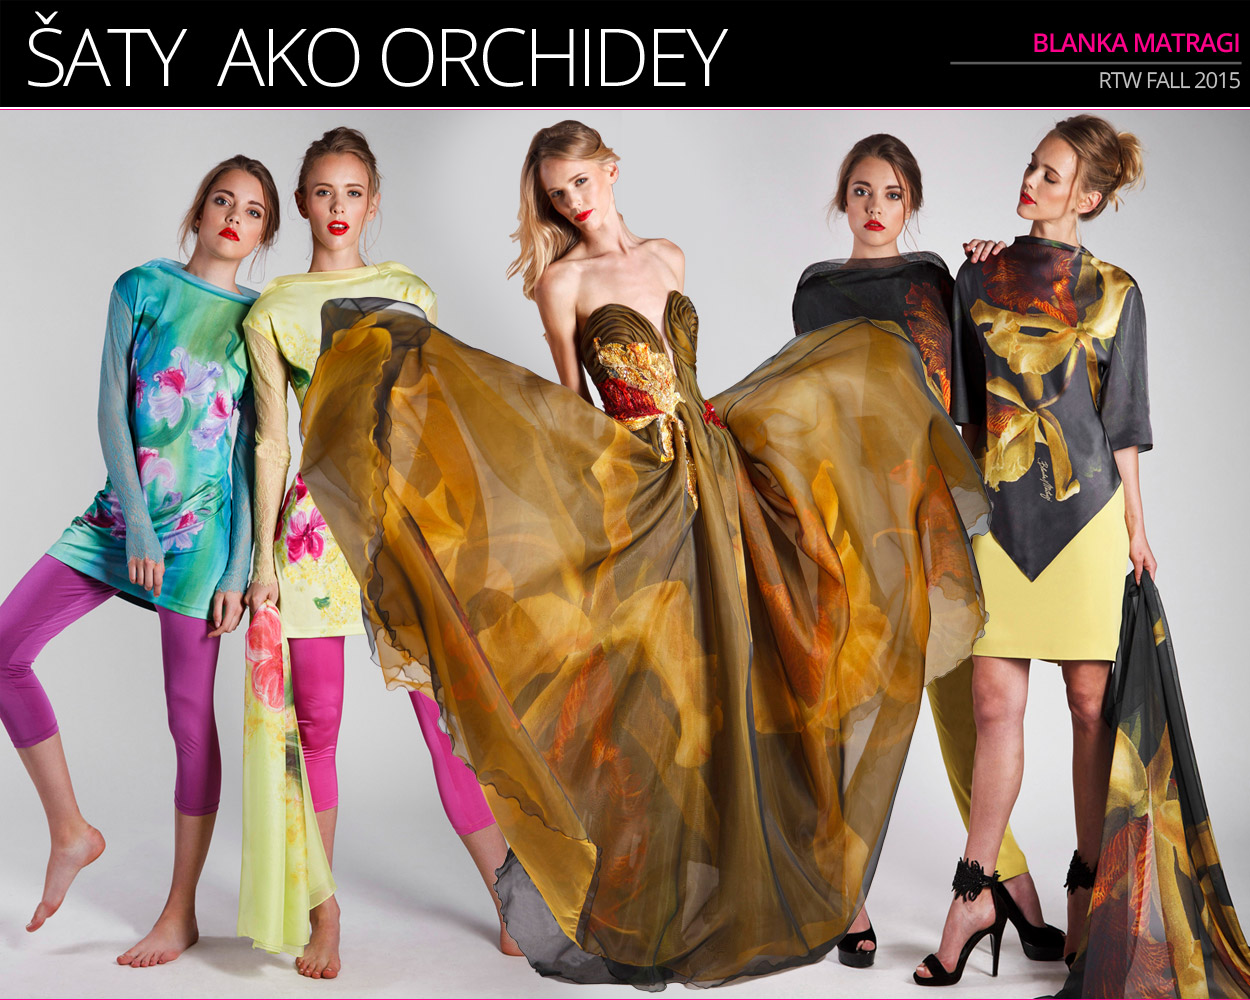 Blanka Matragi a jej RTW móda 2015 v kolekcii Orchidea.